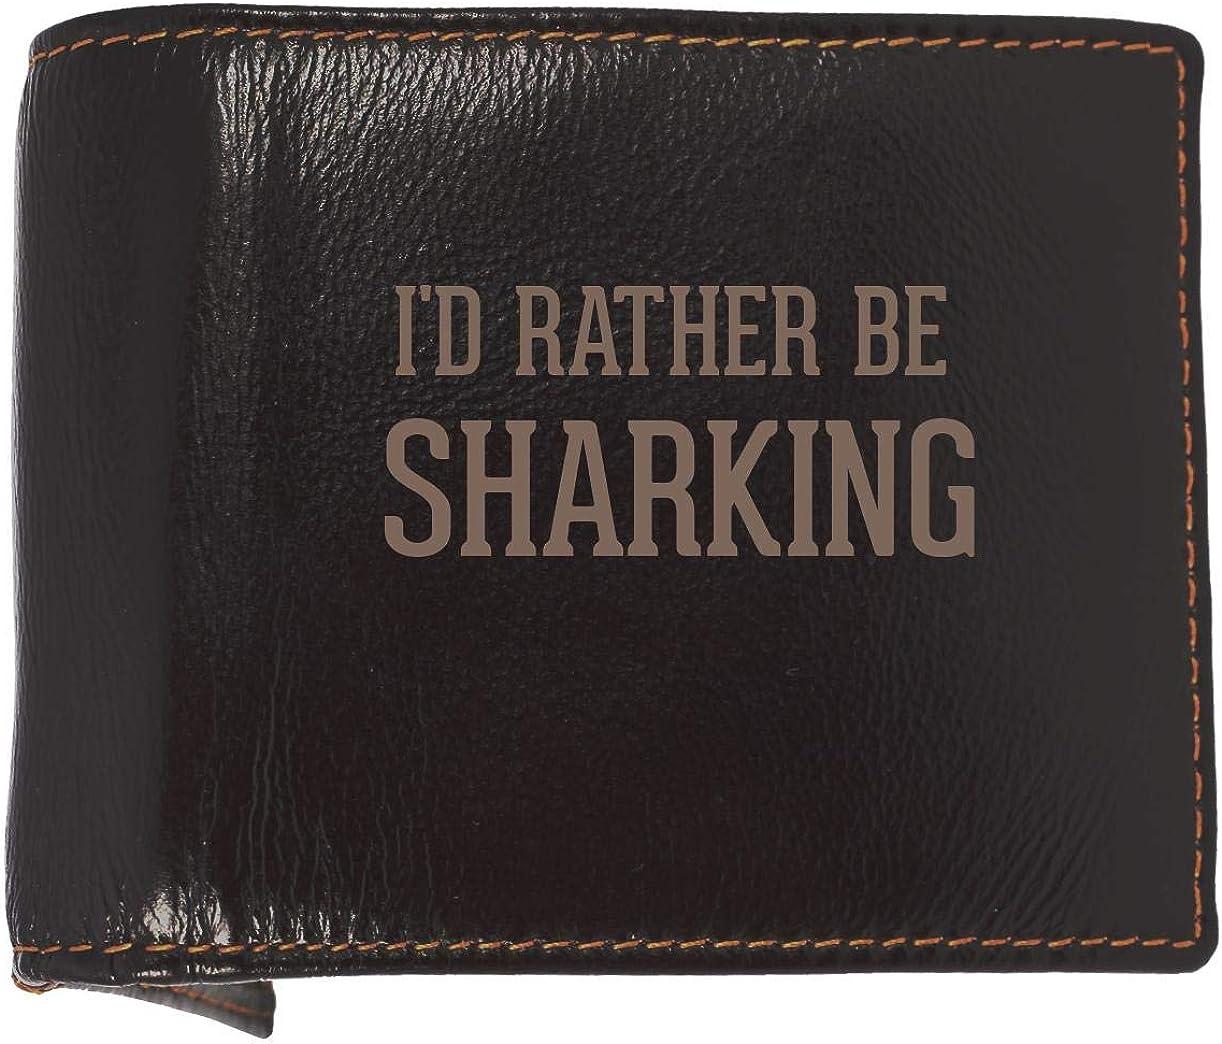 I'd Rather Be SHARKING - Soft Cowhide Genuine Engraved Bifold Leather Wallet